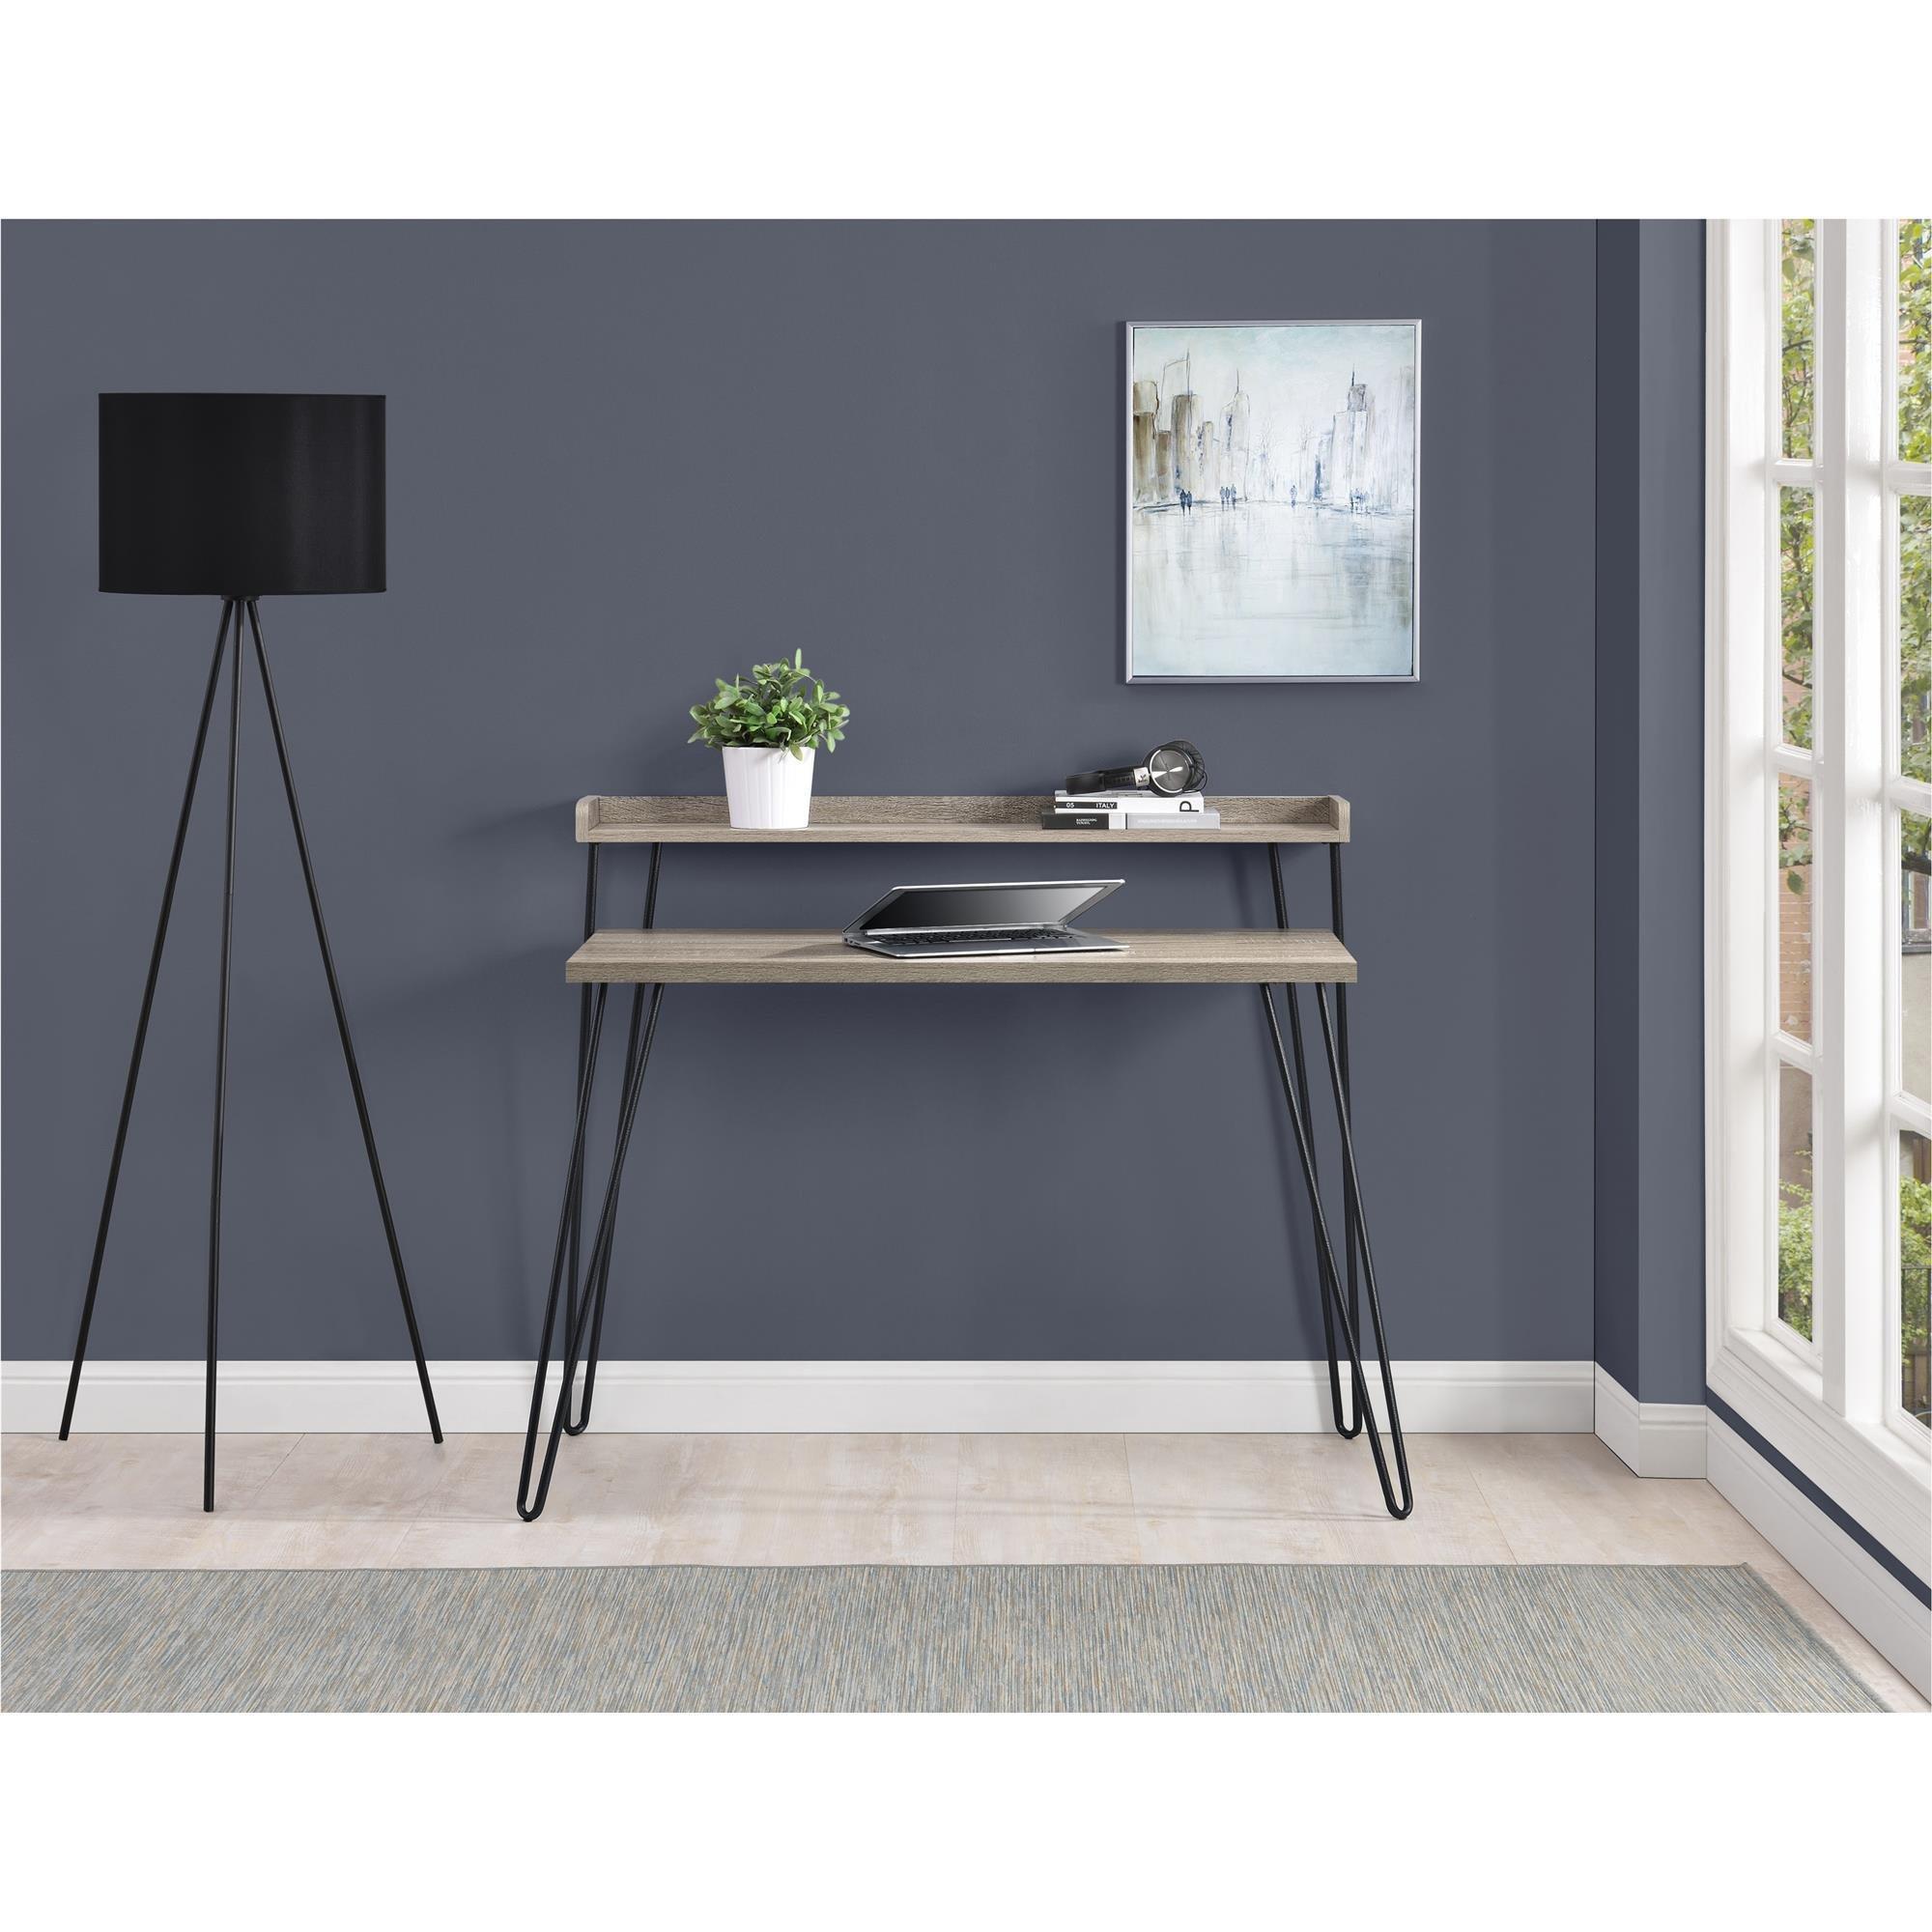 Ameriwood Home Haven Retro Desk Riser, Weathered Oak by Ameriwood Home (Image #4)